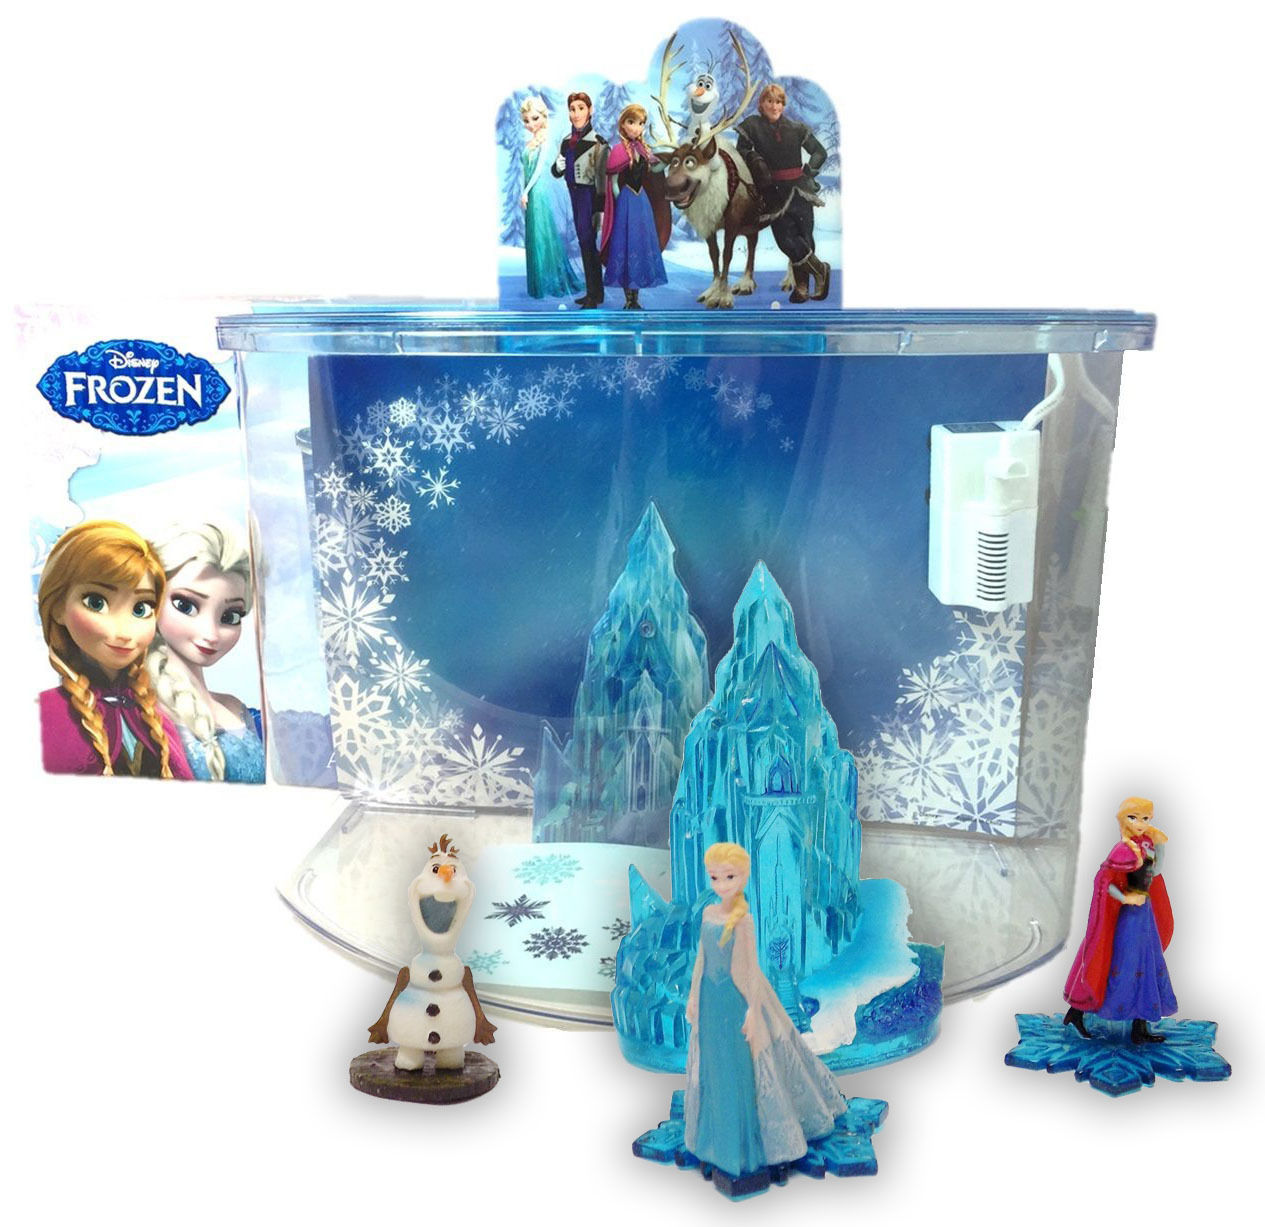 Disney frozen elsa anna olaf castle ornament penn plax for Aquarium decoration sealant